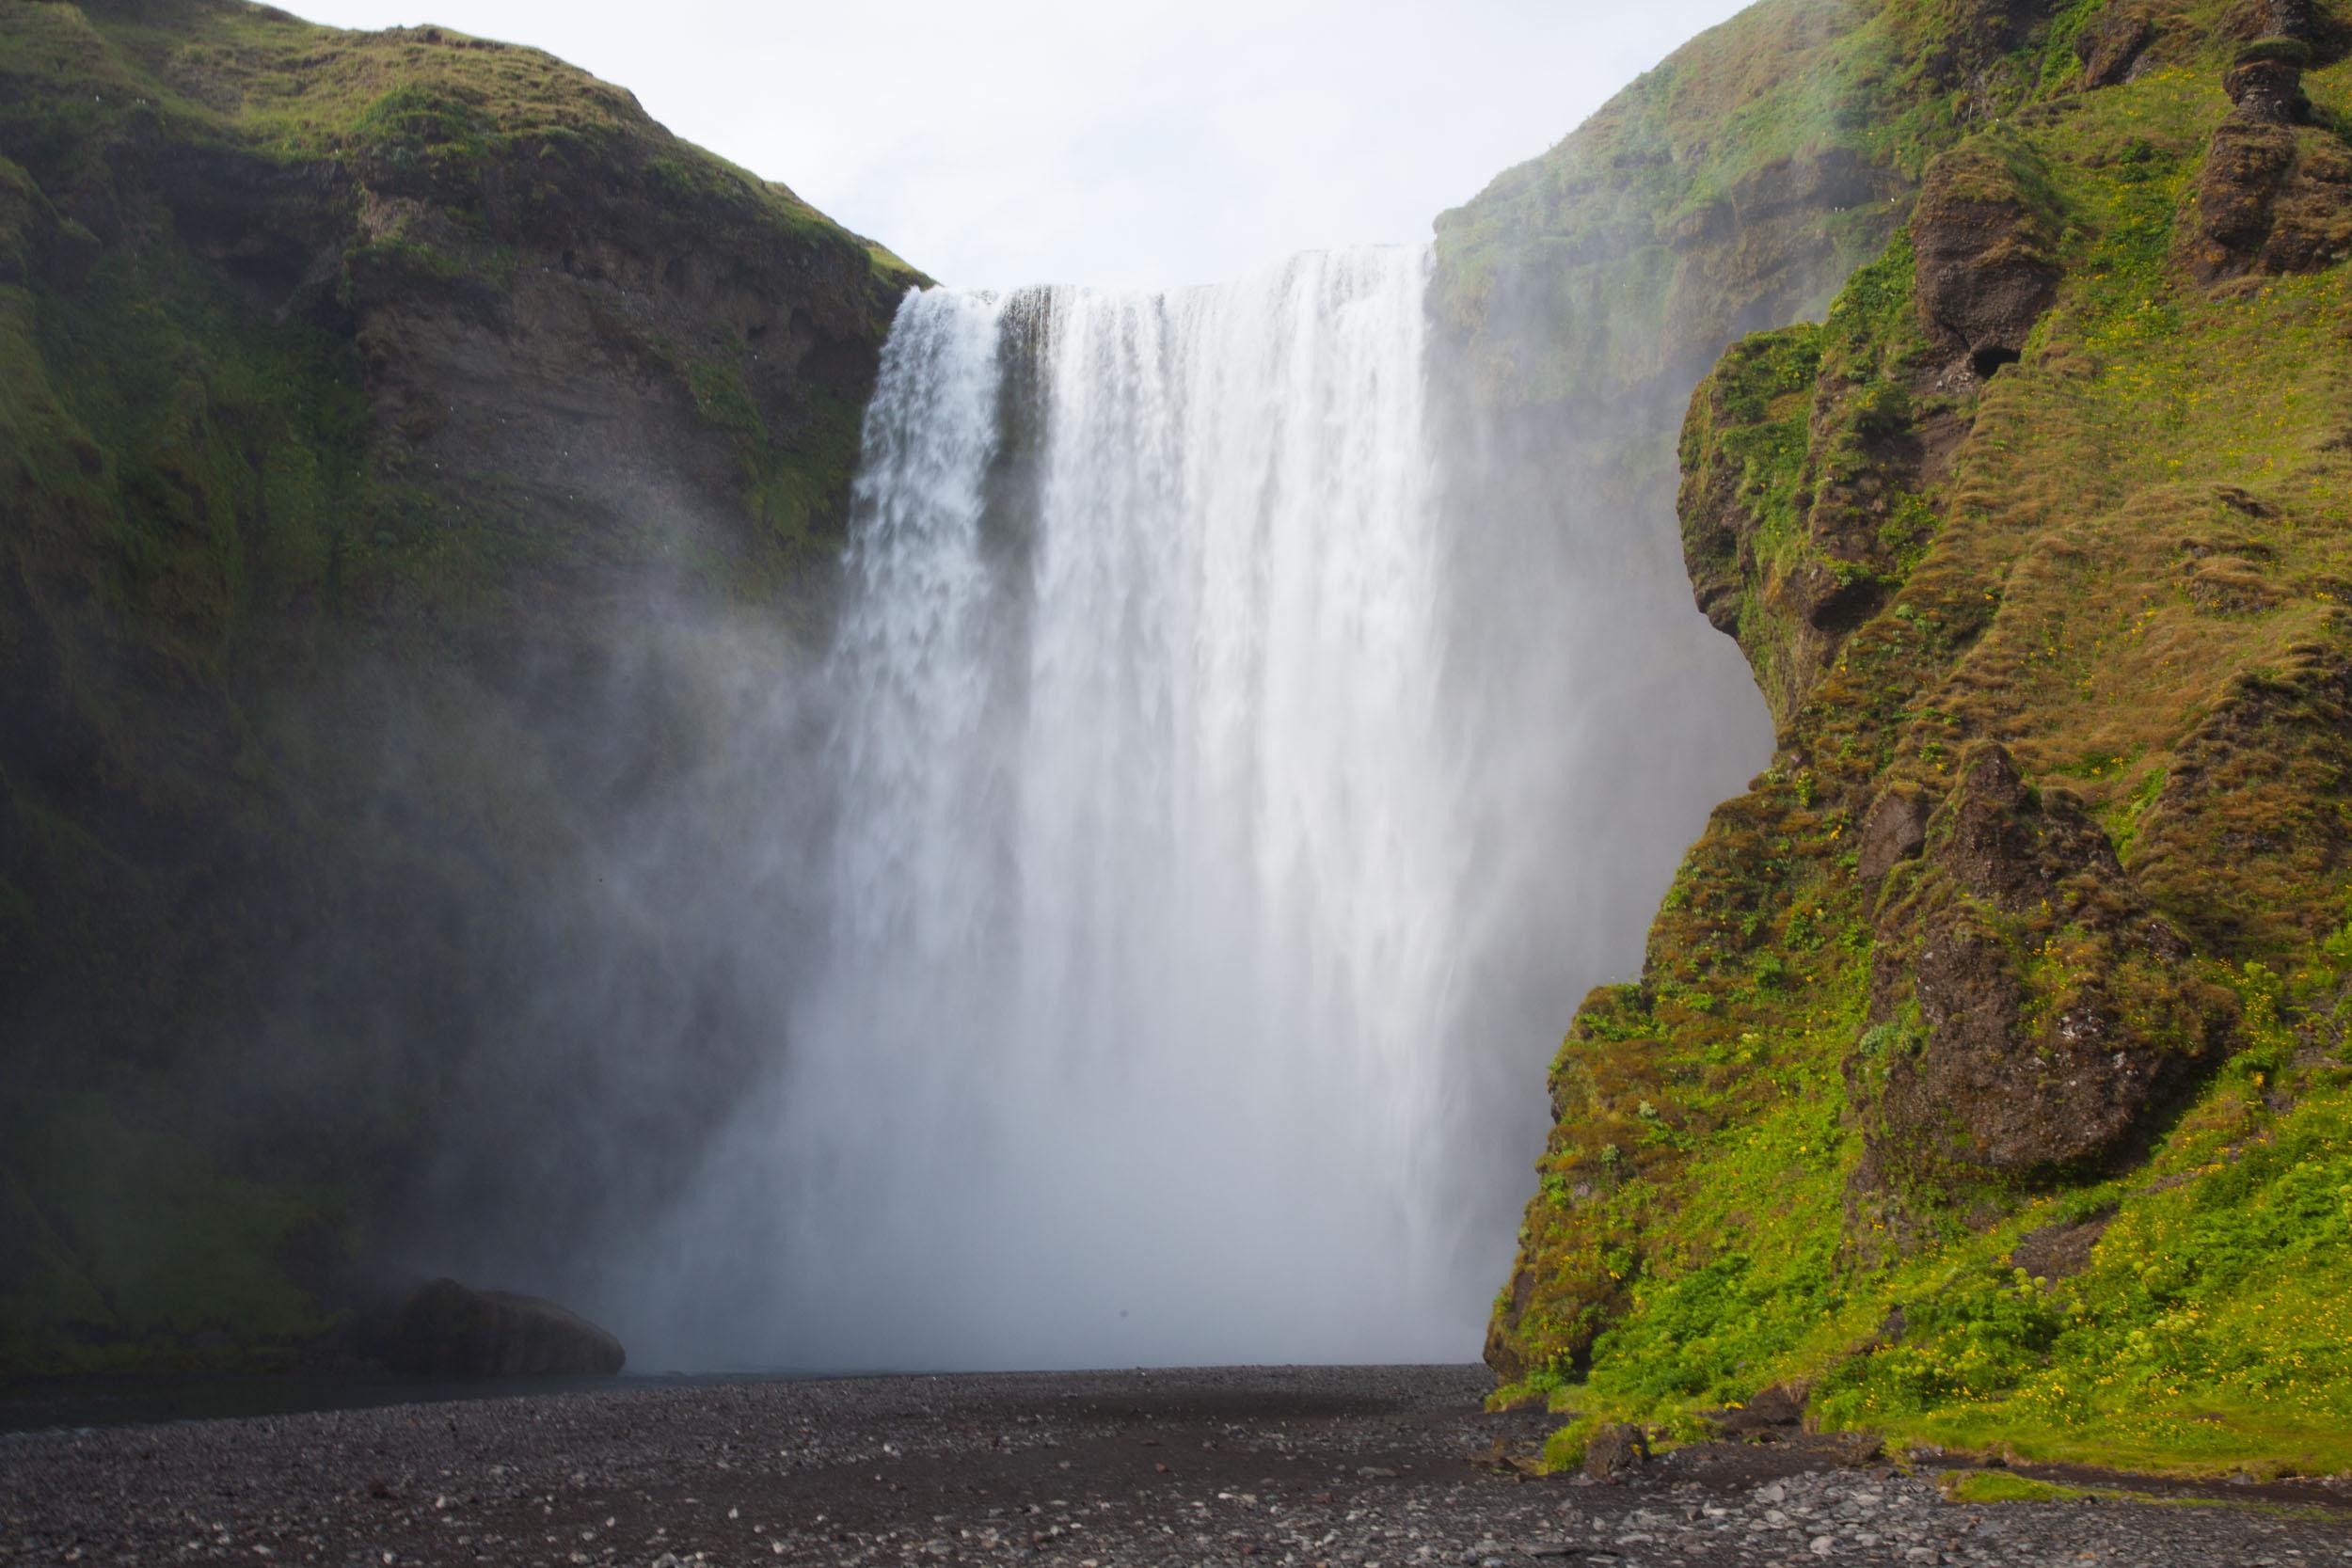 Falls Hd Wallpaper Free Download Dettifoss Waterfall In Southern Iceland Rana Banerjee